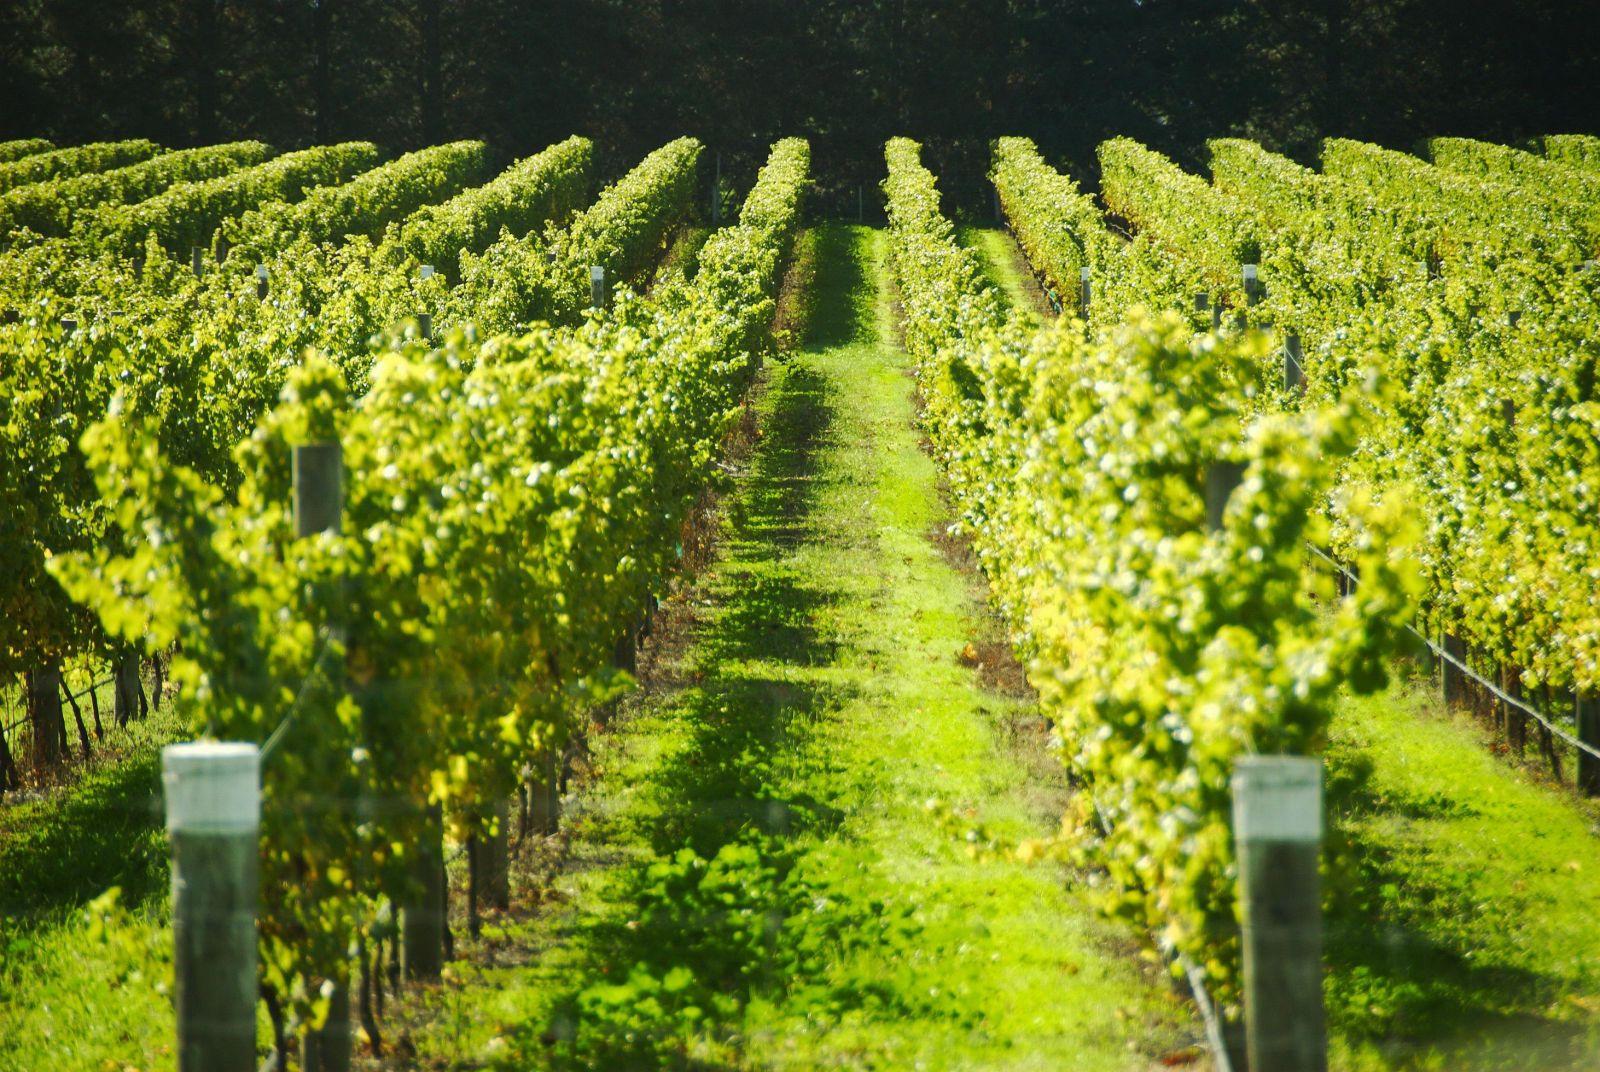 Tenuta Torciano: Between Wine and Nature